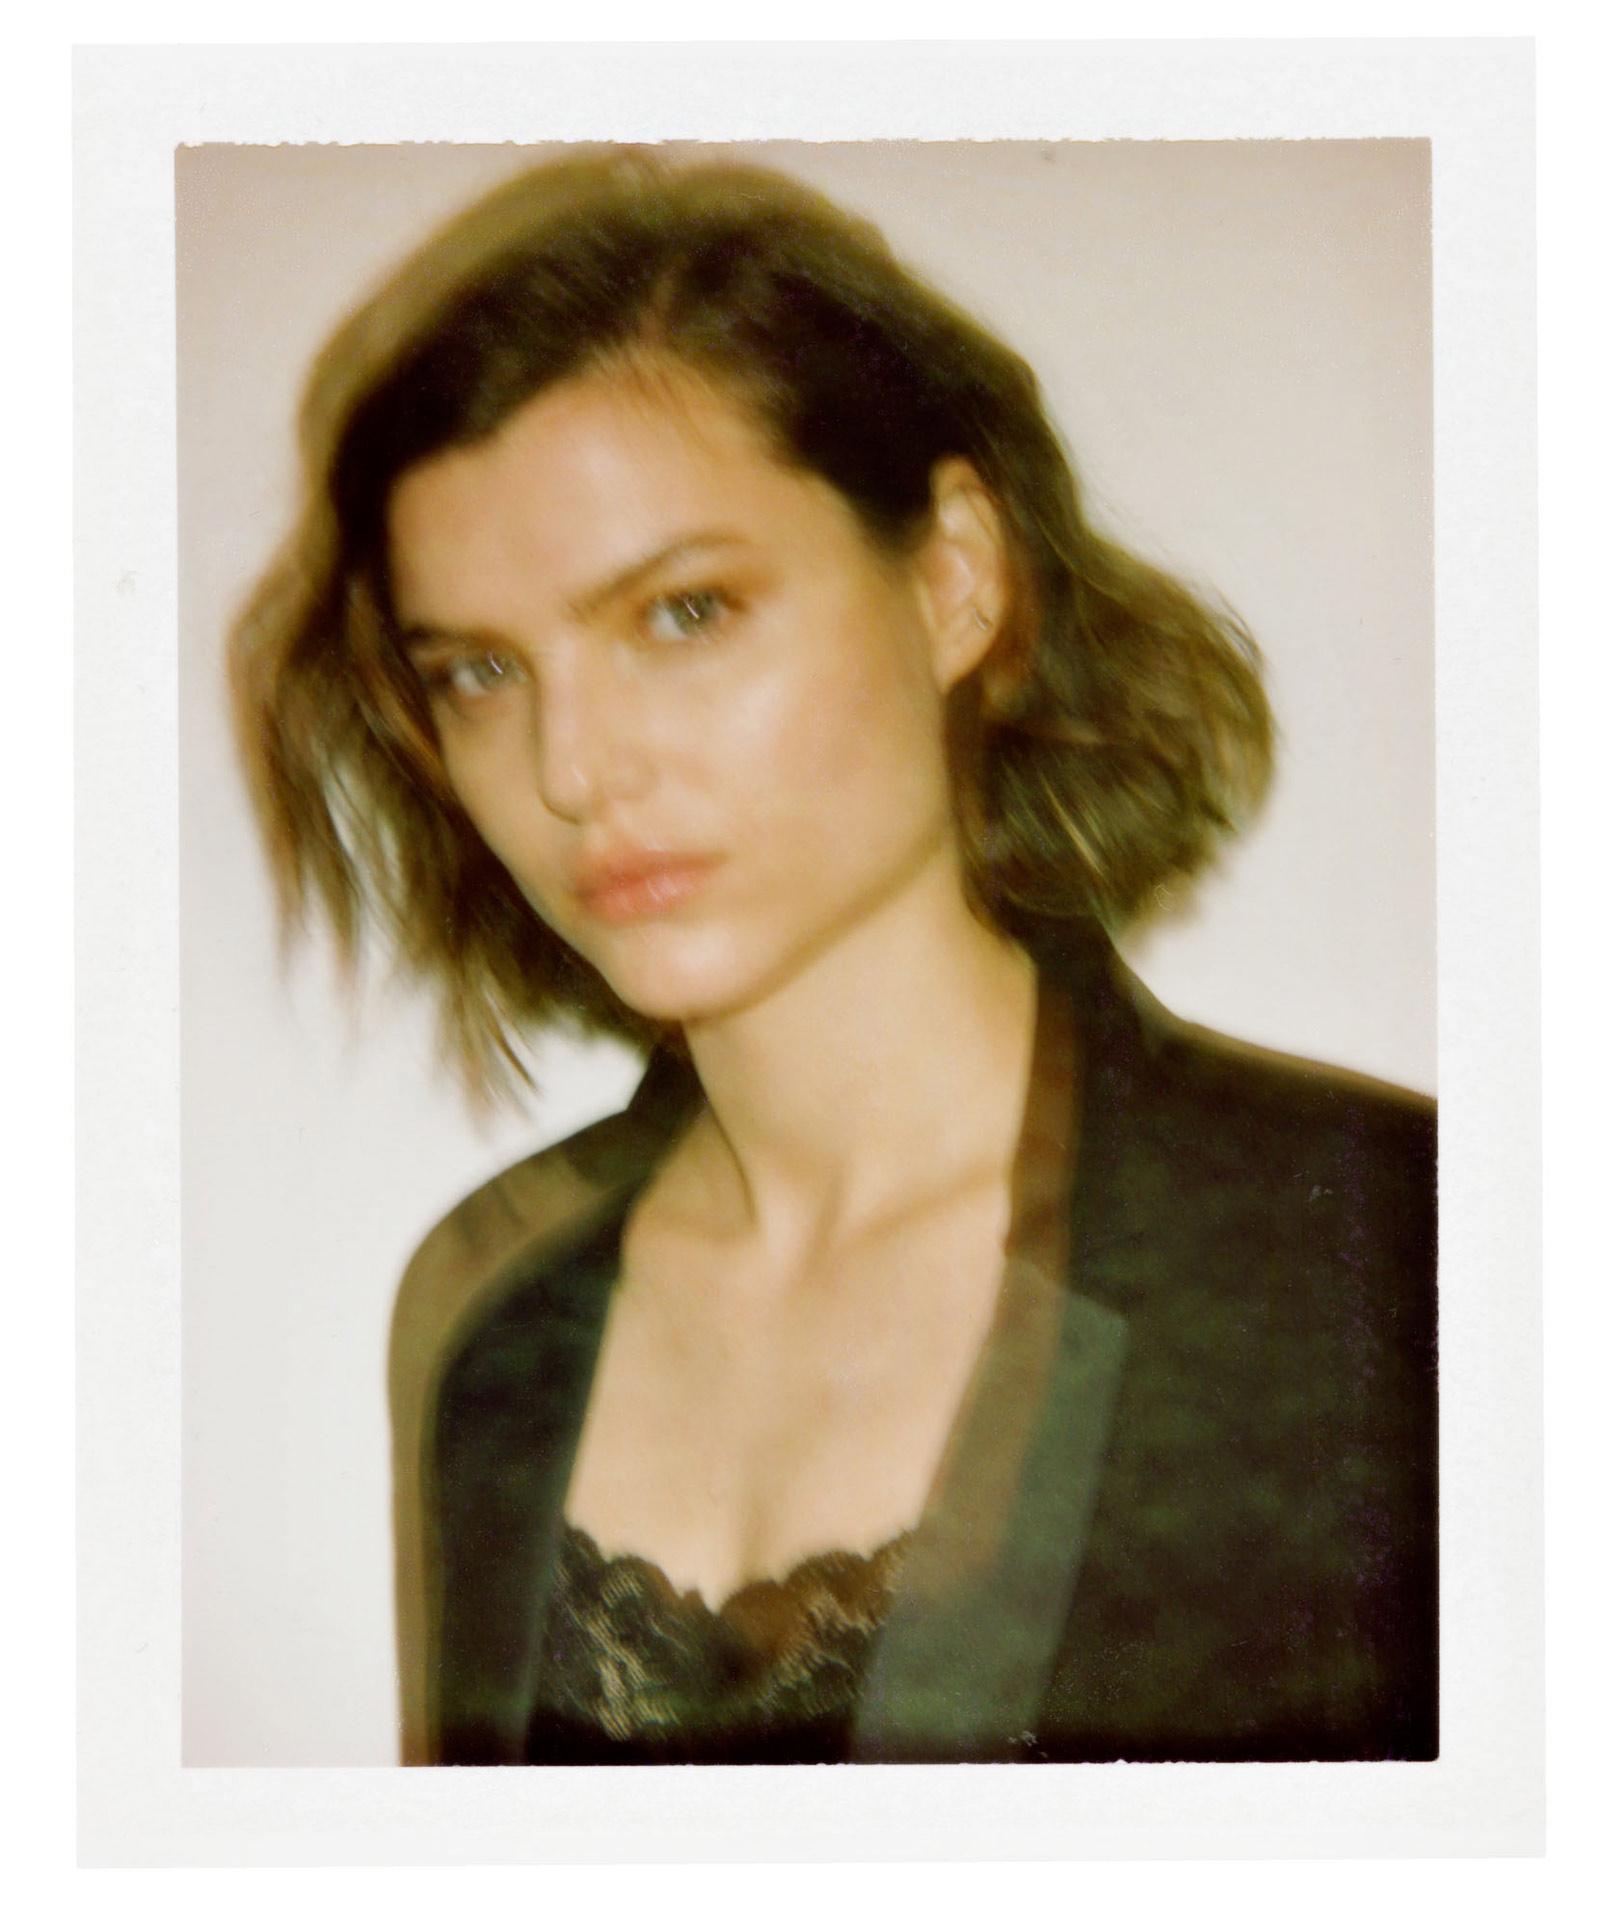 Emilia_Vuciniv_Models_dot_13_web-1600_06.jpg